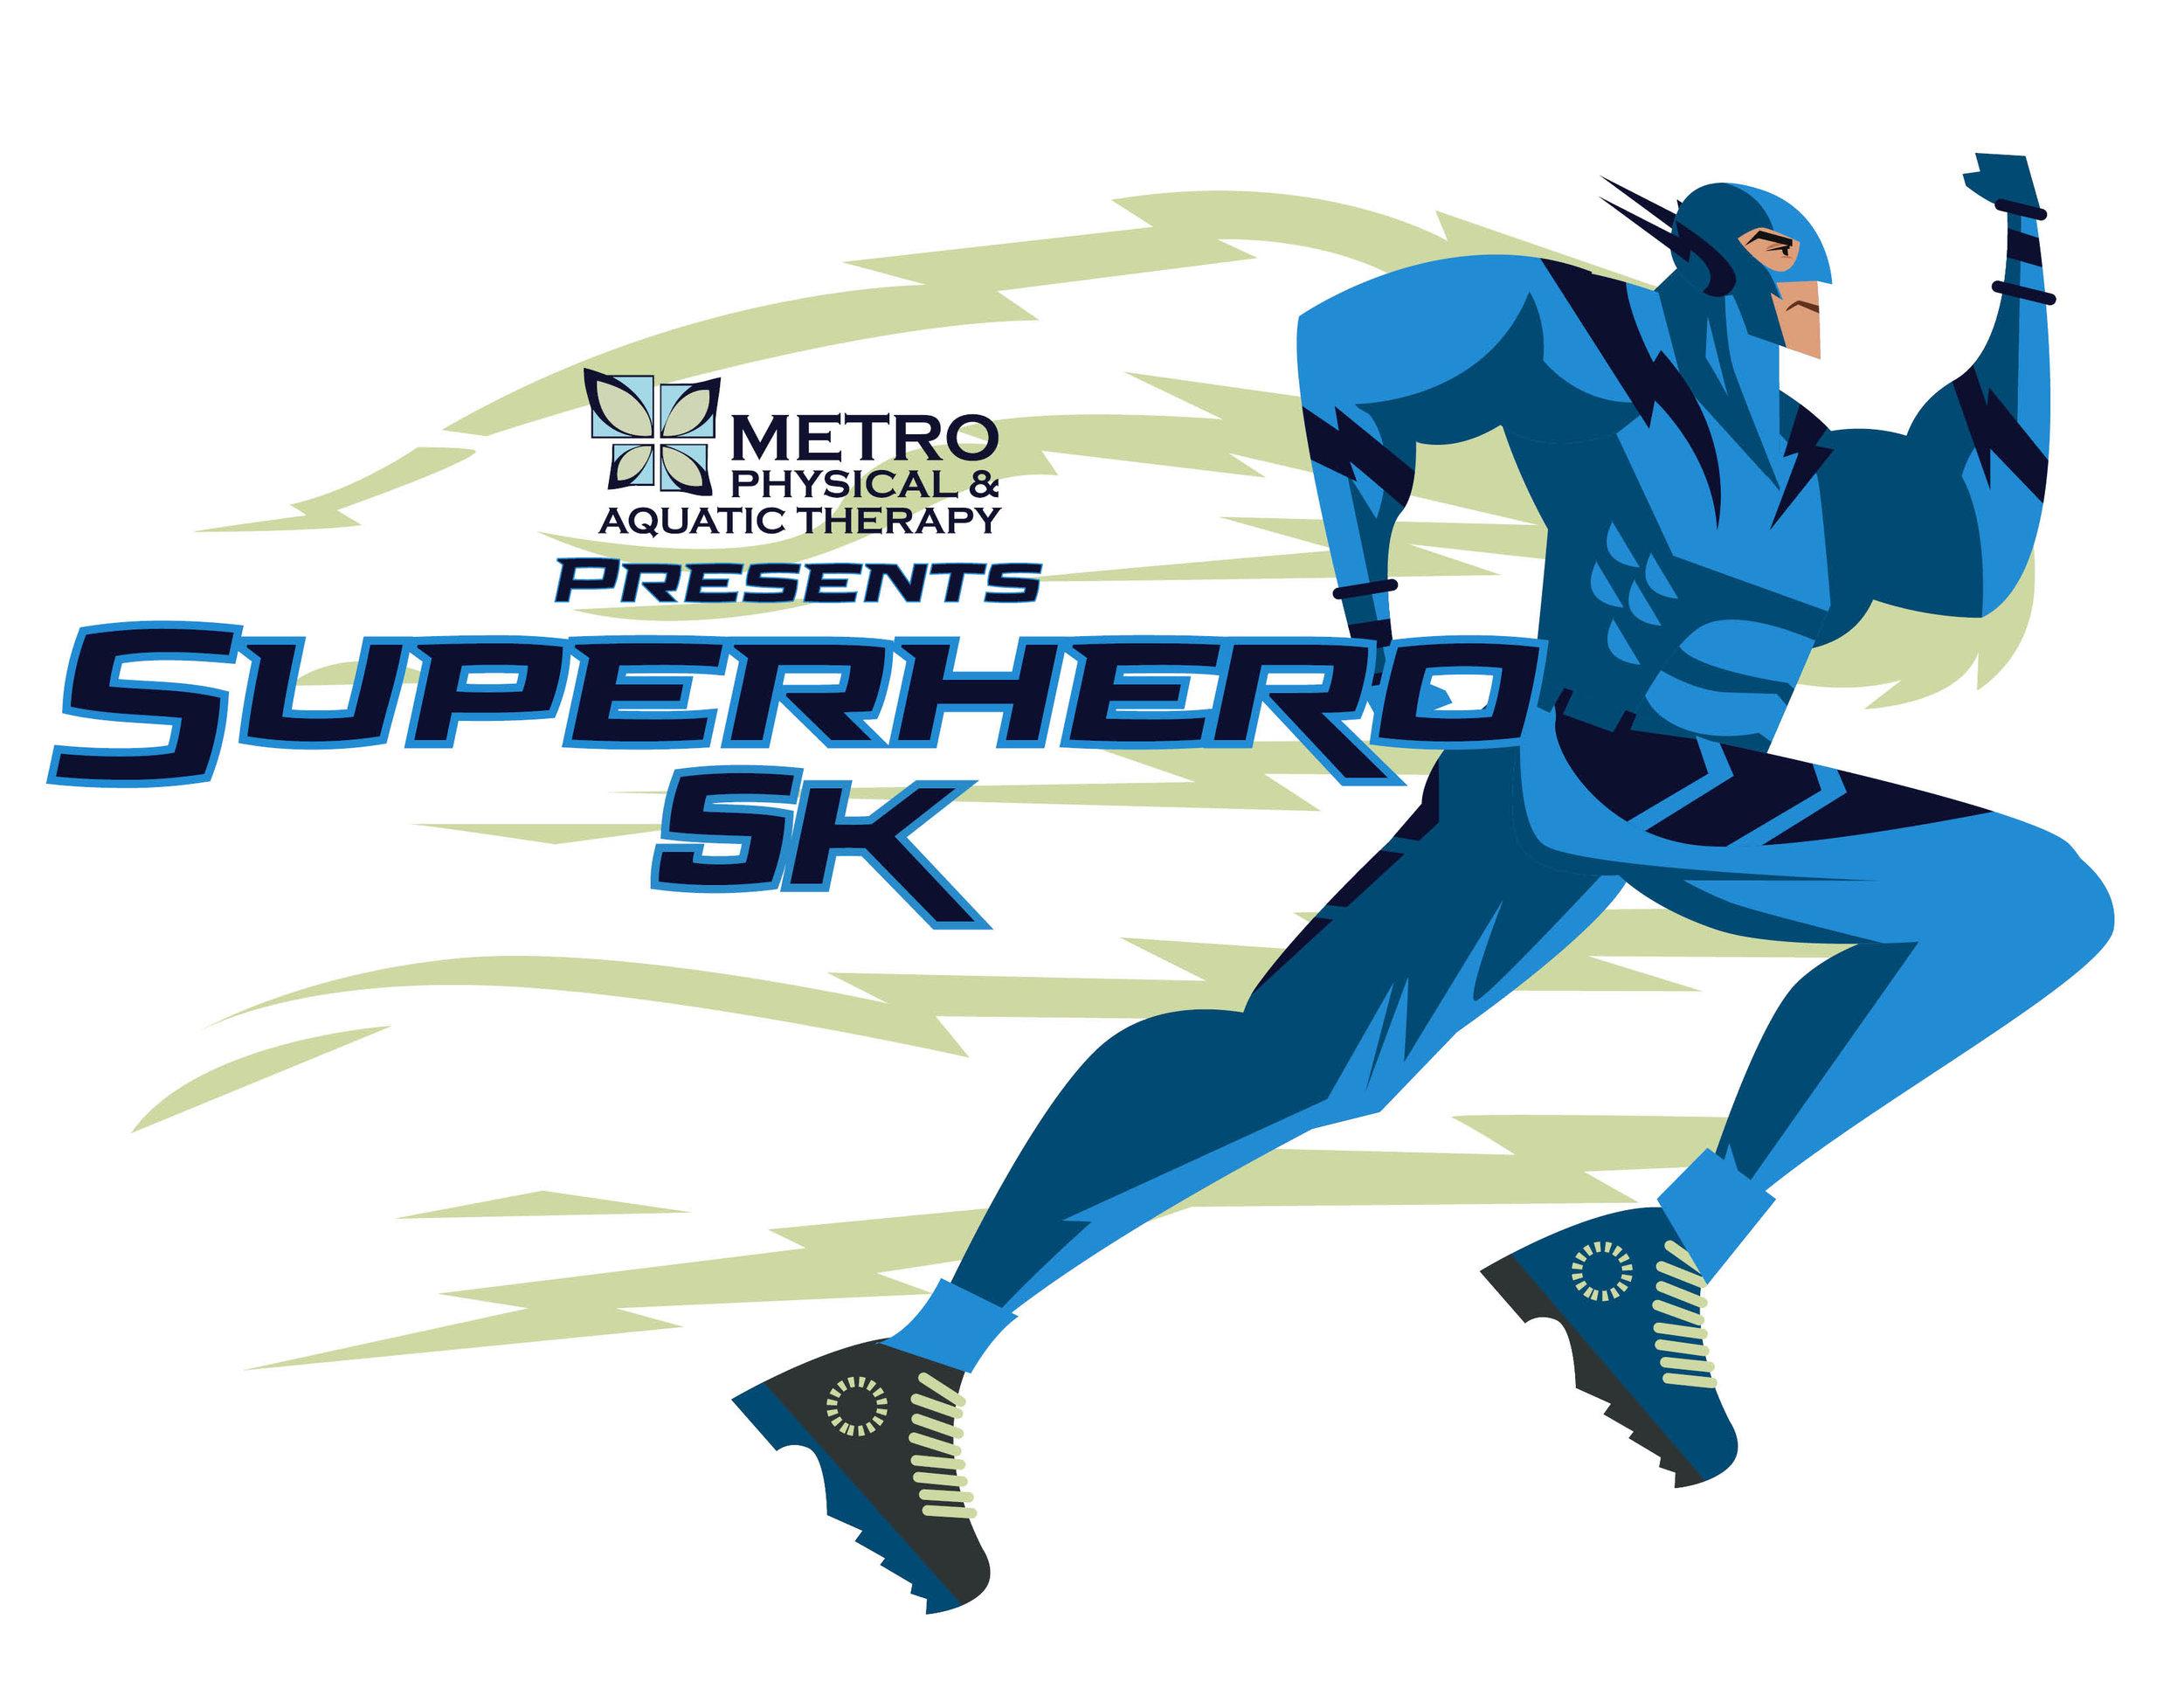 Superhero 5k5.jpg